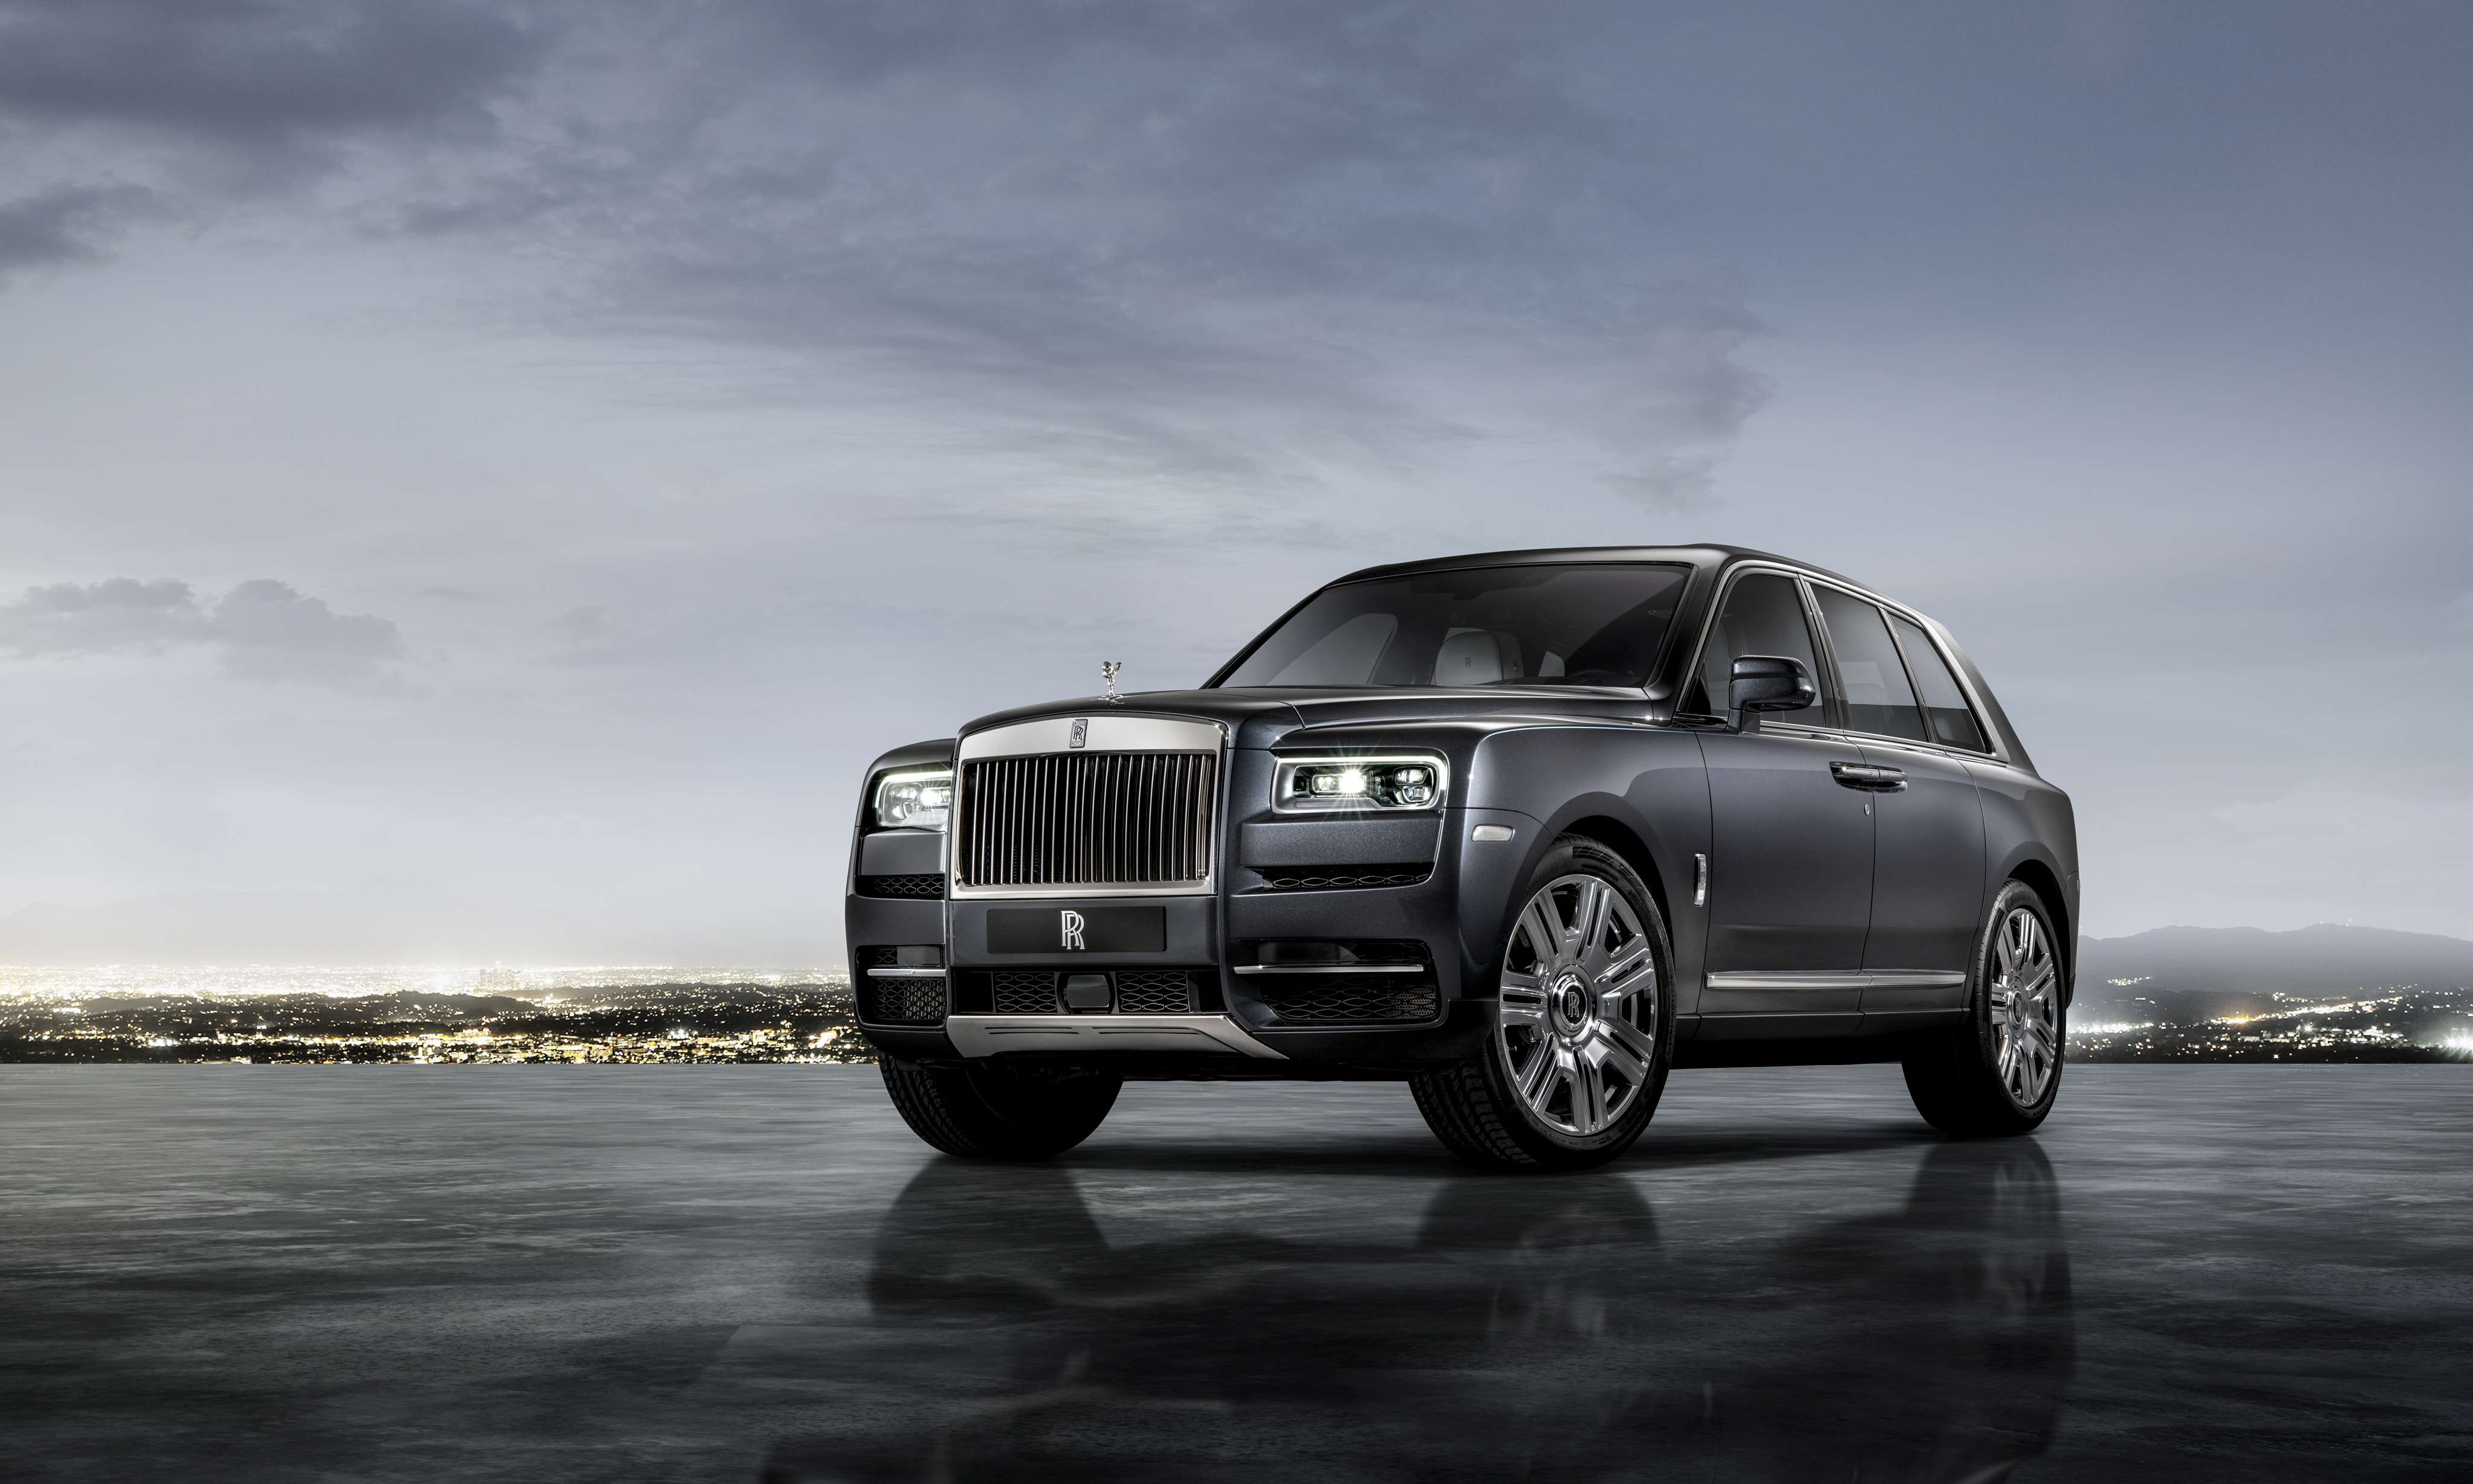 Rolls Royce Cullinan 4k, HD Cars, 4k Wallpapers, Images